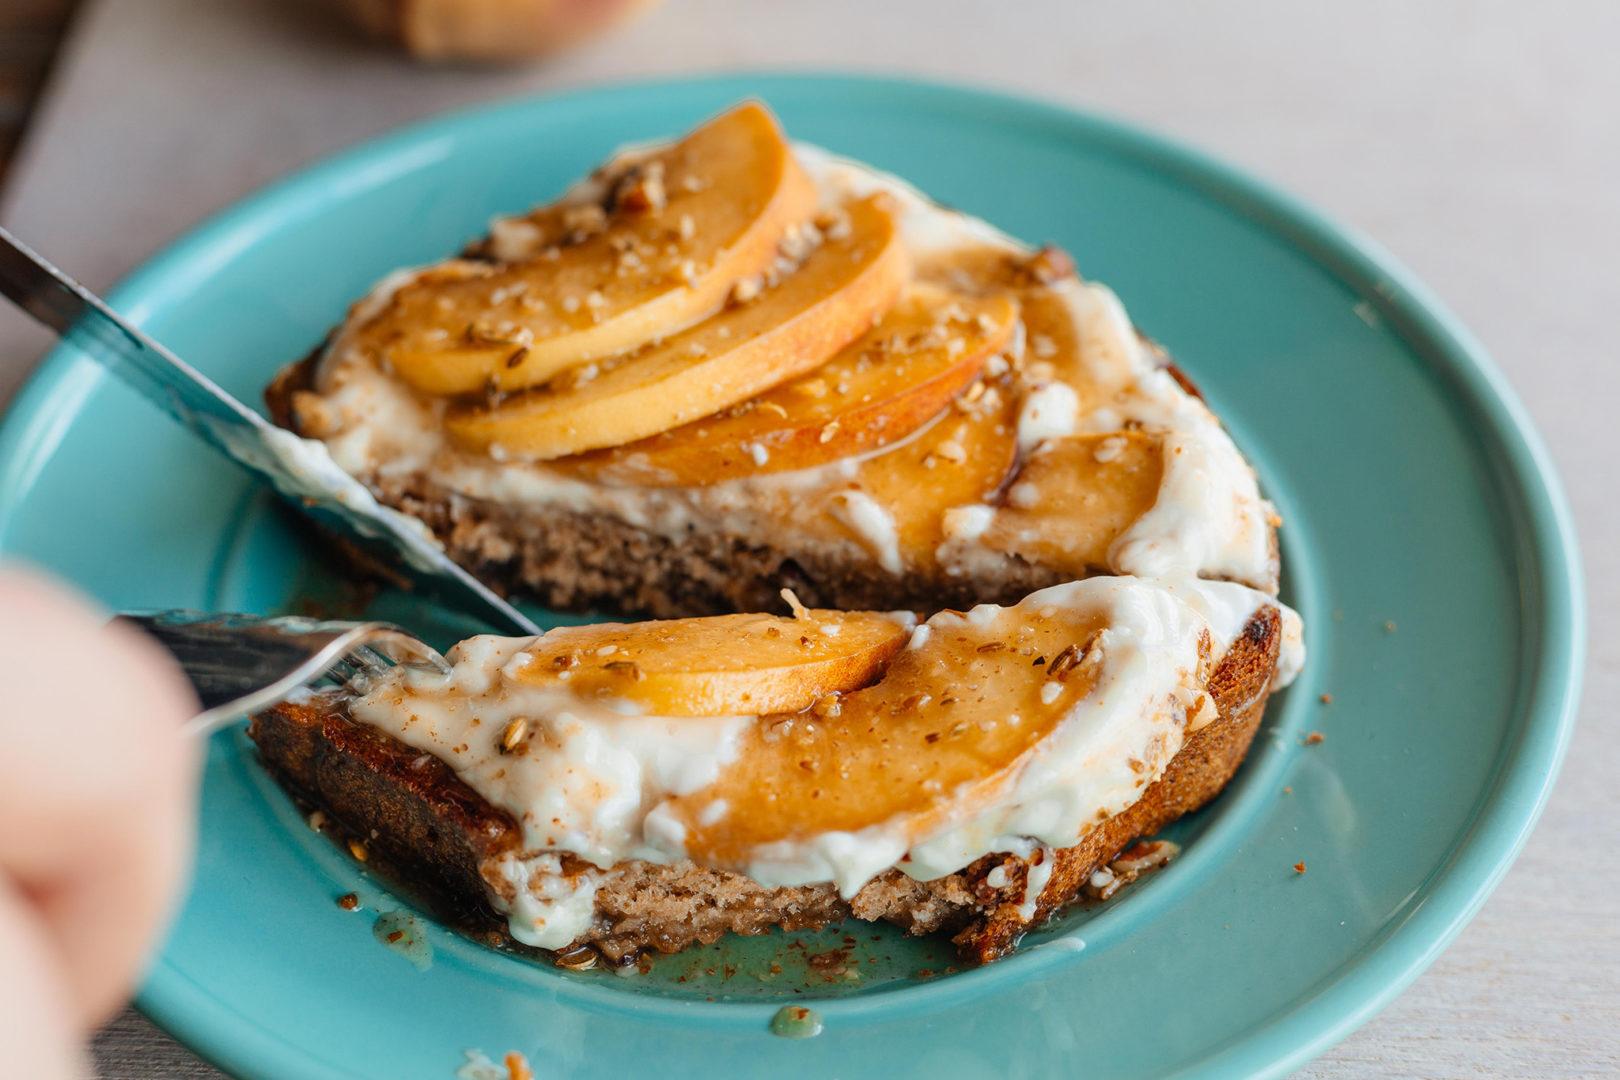 Seeded Honey Peach Goat Cheese Toast